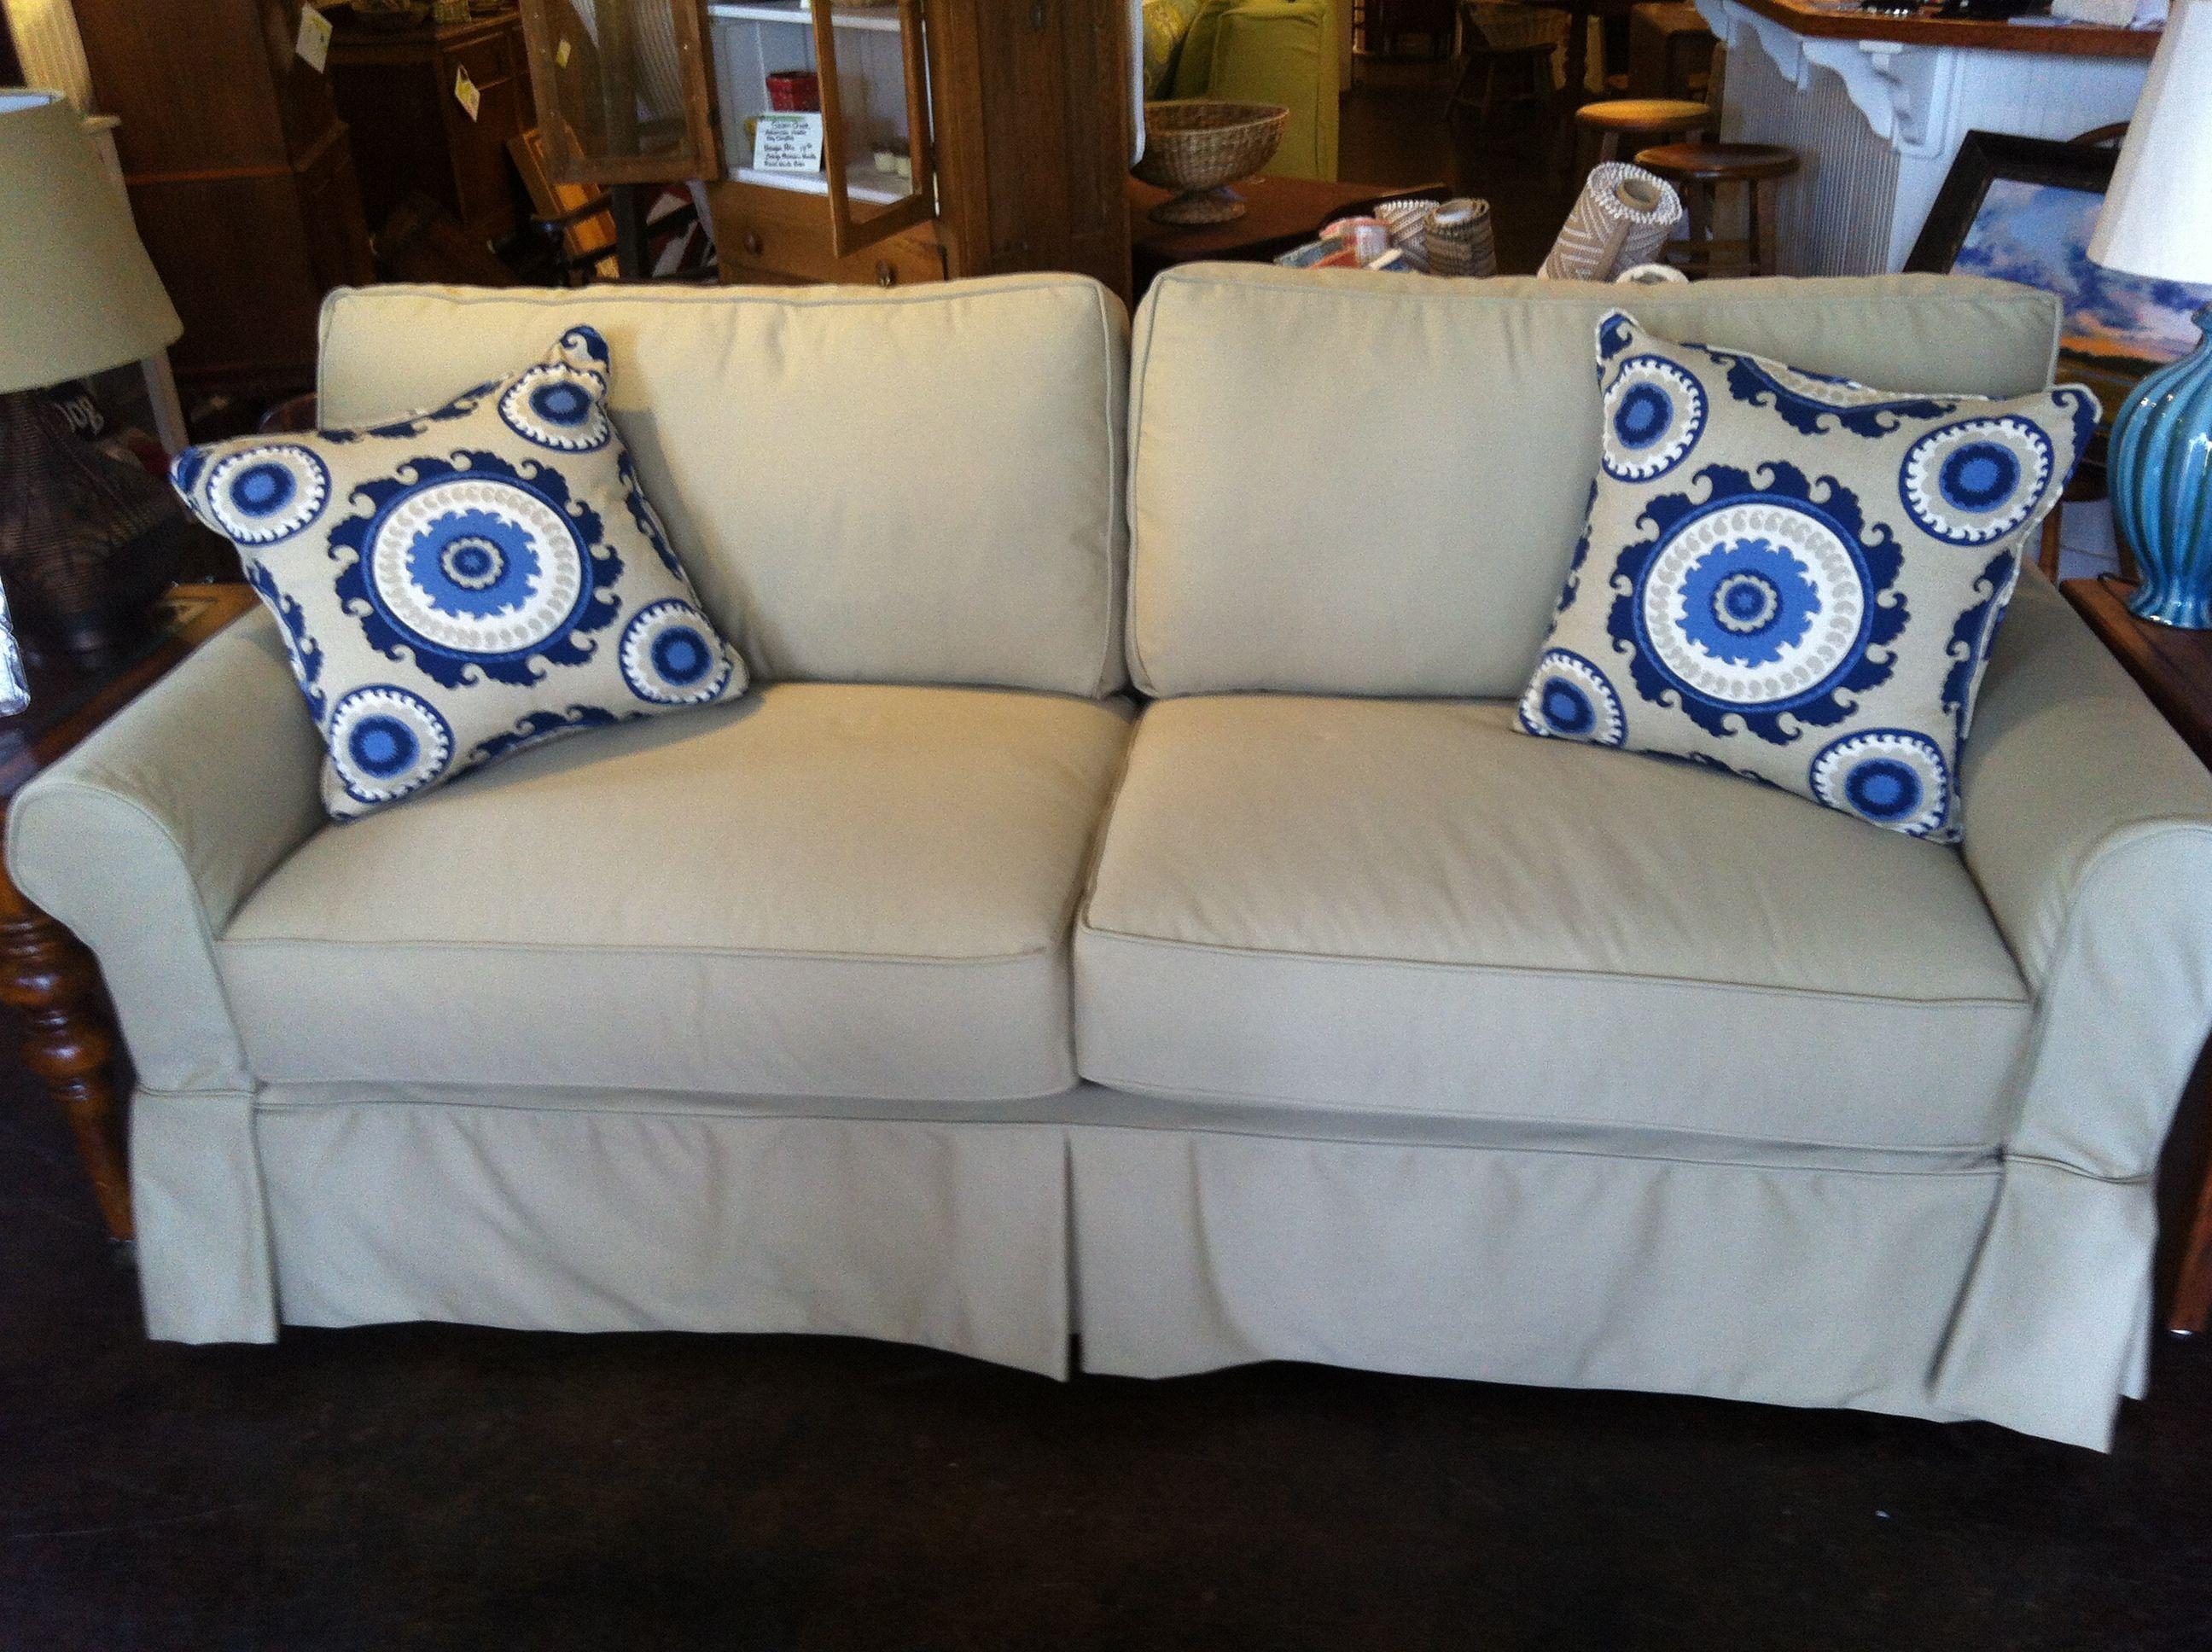 Home Goods Sofa Covers Black Faux Leather Sleeper Four Seasons Alexandria Slip Covered Furniture